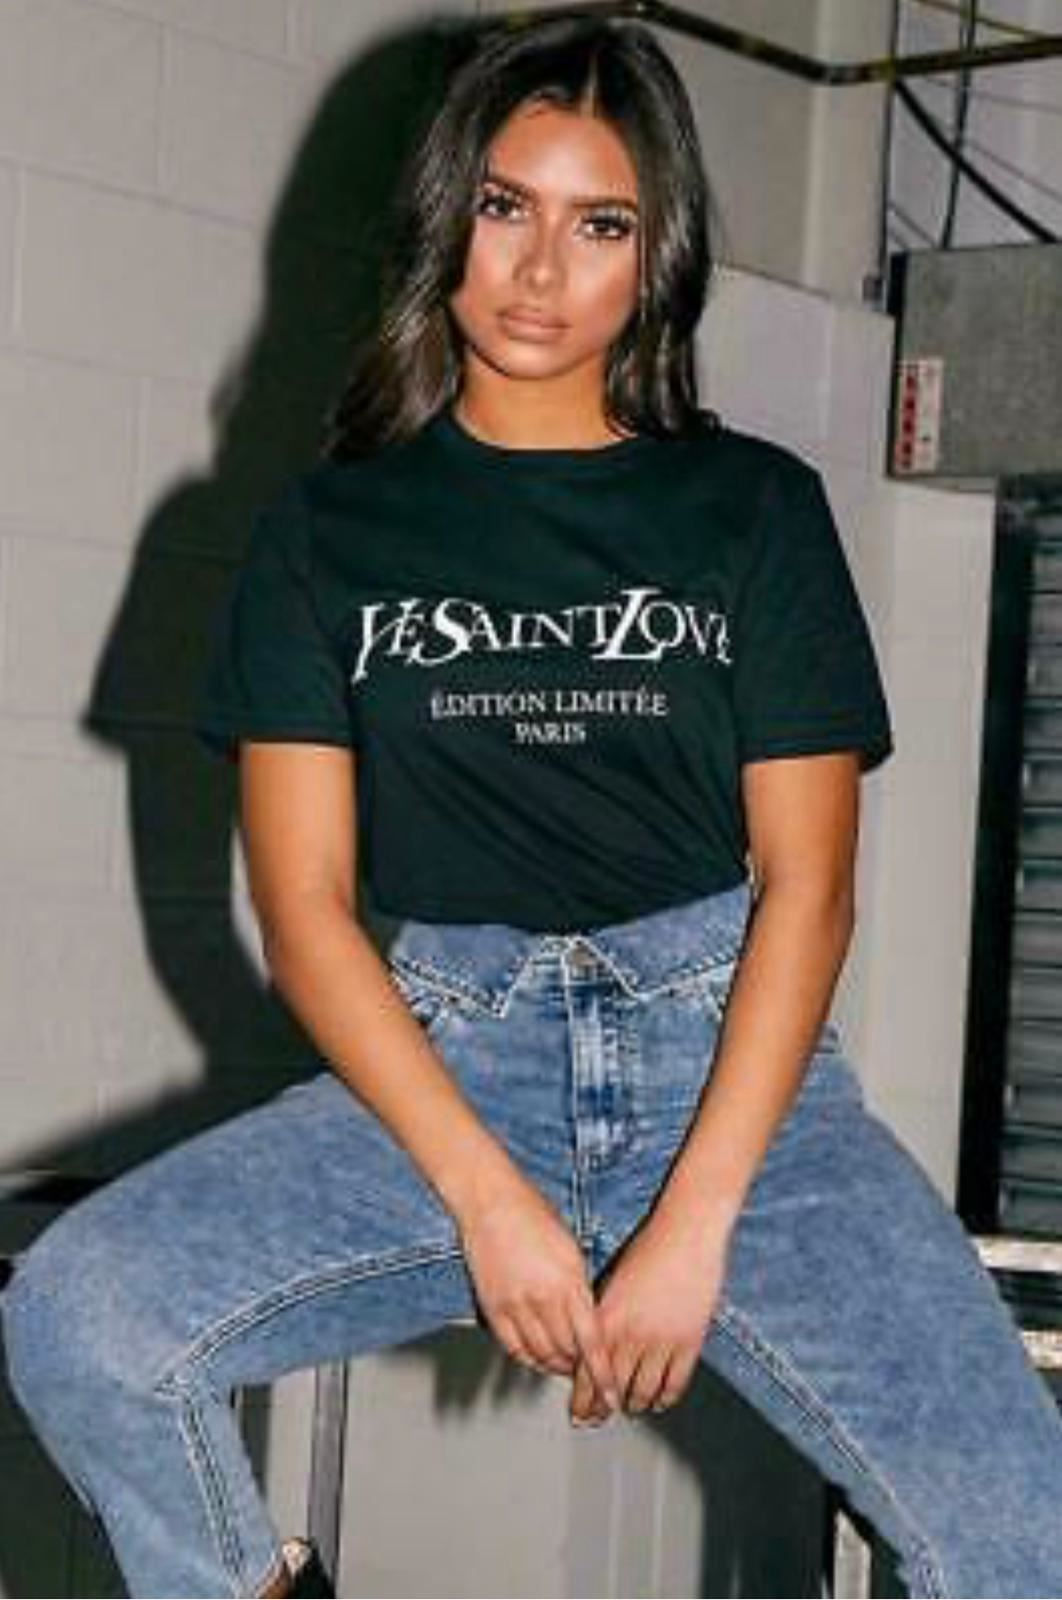 thumbnail 23 - Womens OH HONEY Slogan Fashion T-Shirt Ladies Casual Summer Short Sleeve Tops